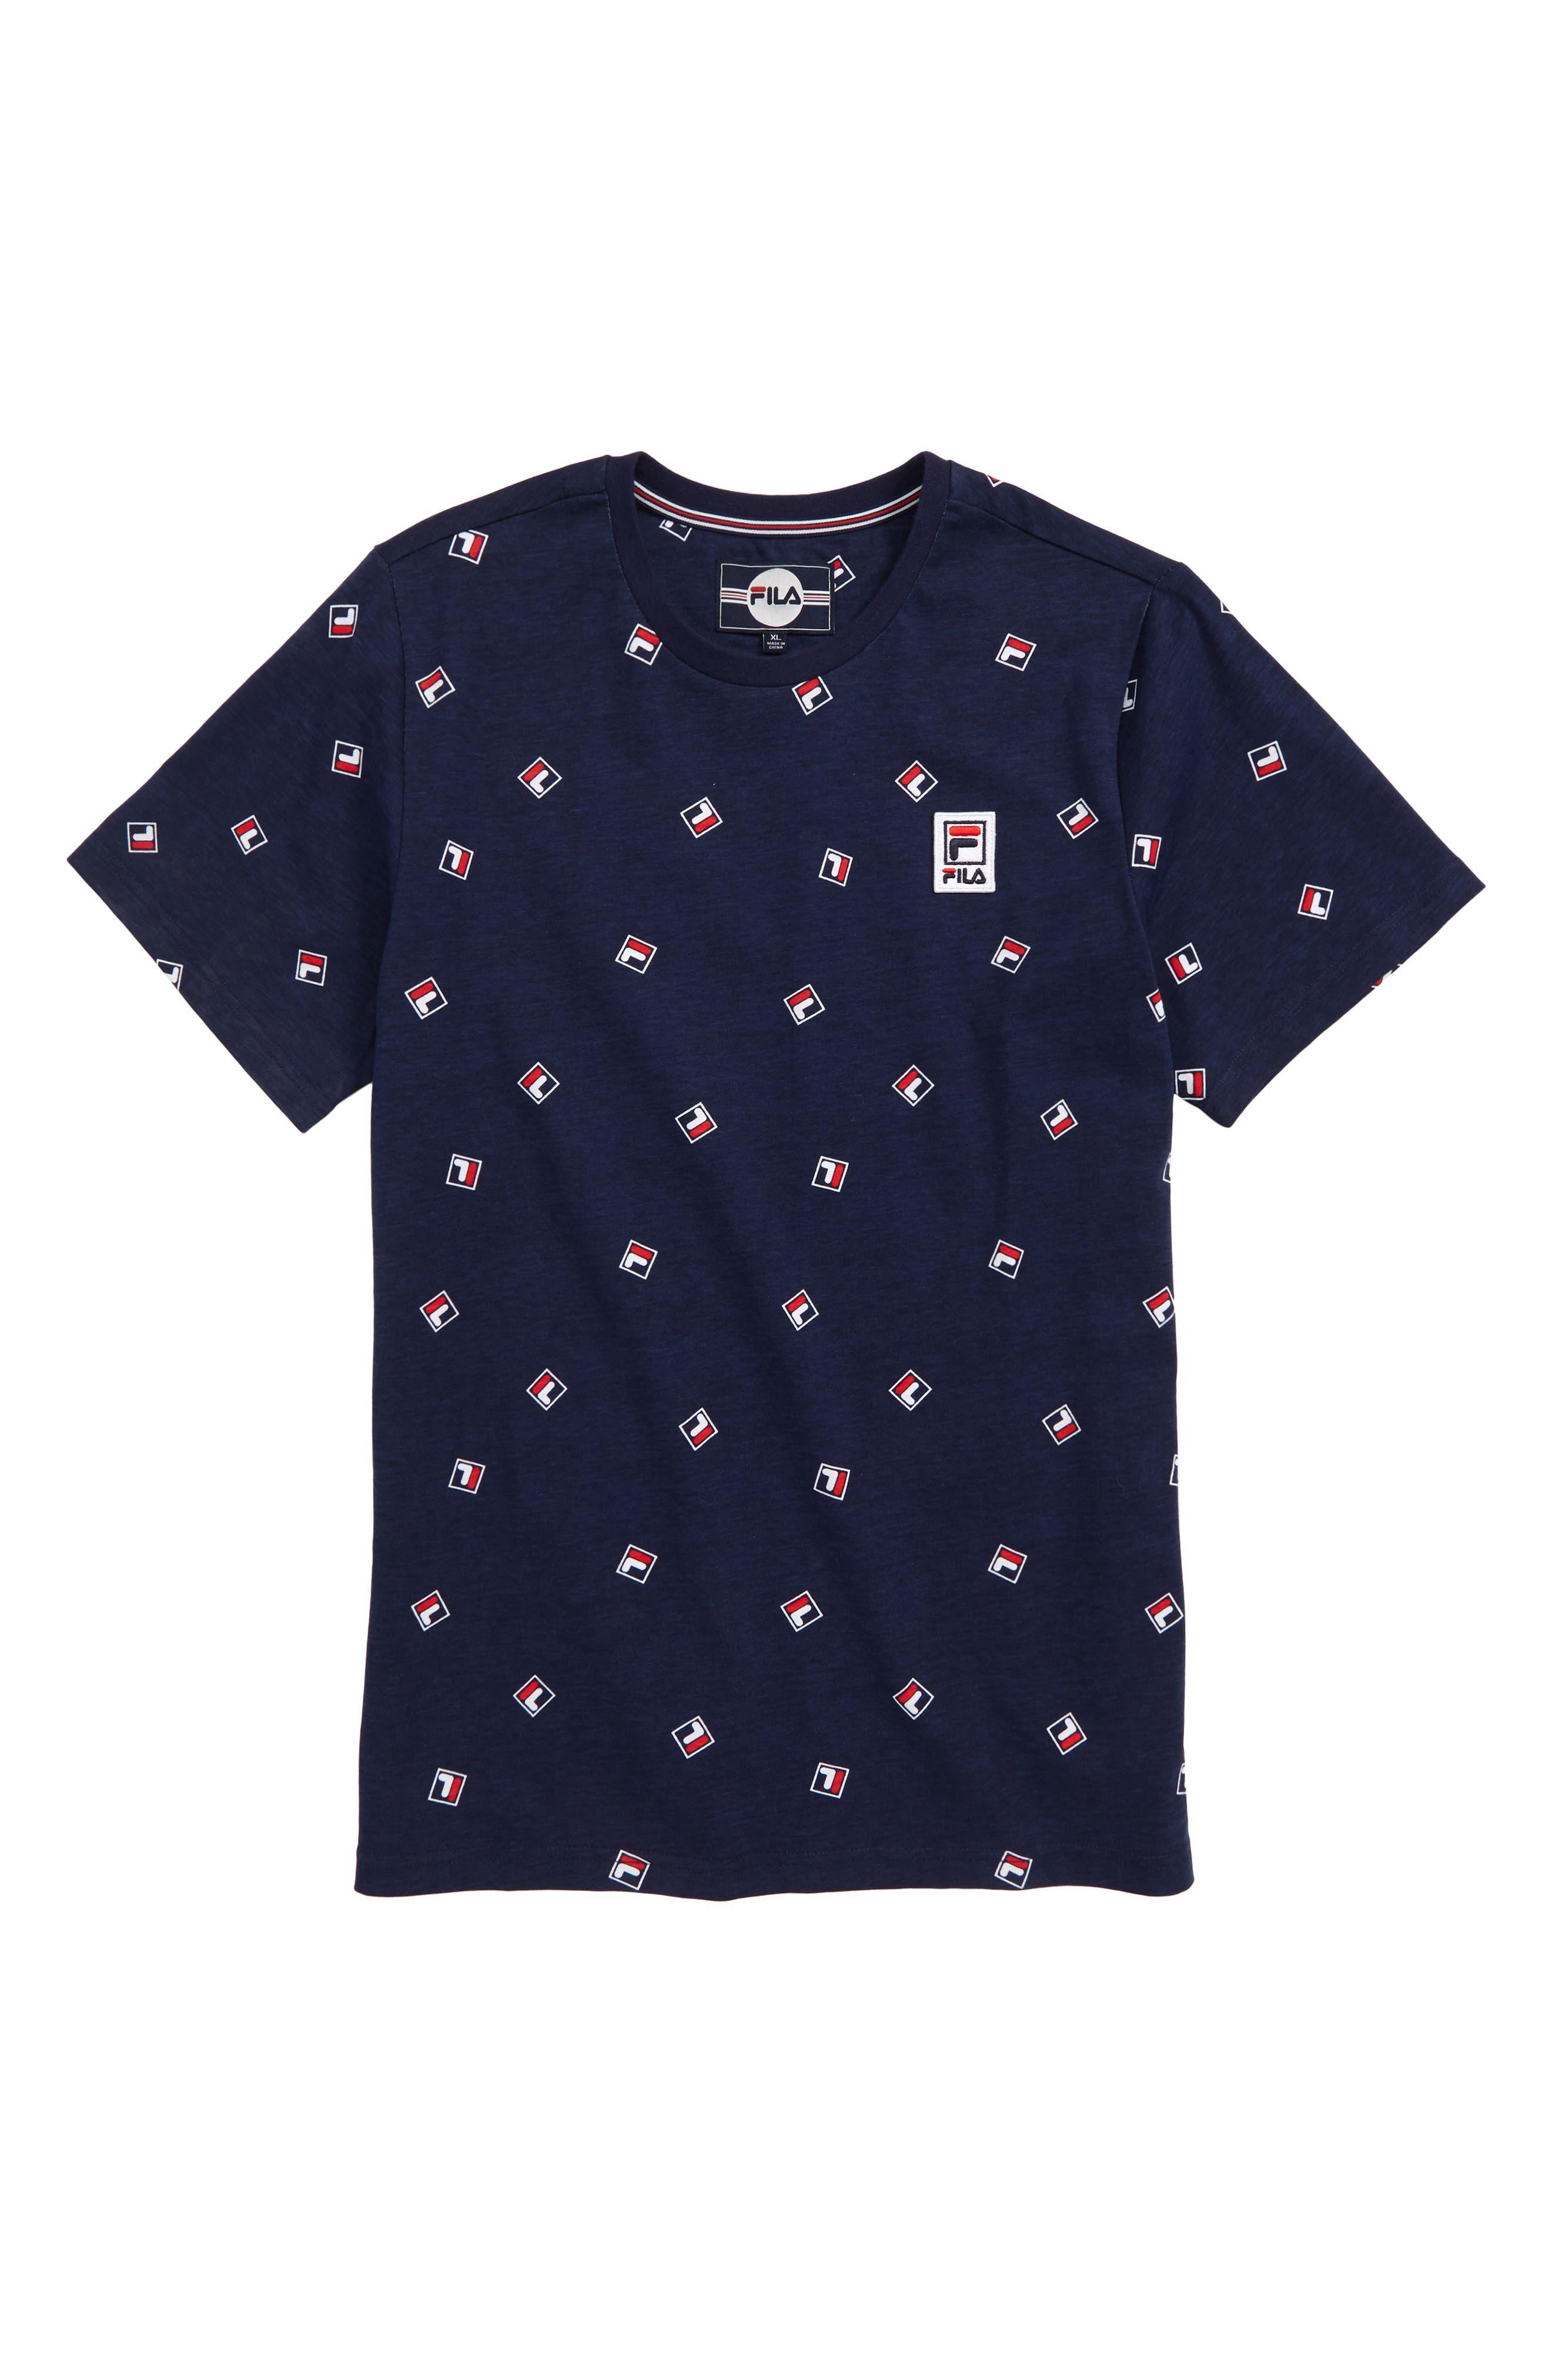 release date 567e3 f5600 Boys  FILA Clothing  Hoodies, Shirts, Pants   T-Shirts   Nordstrom